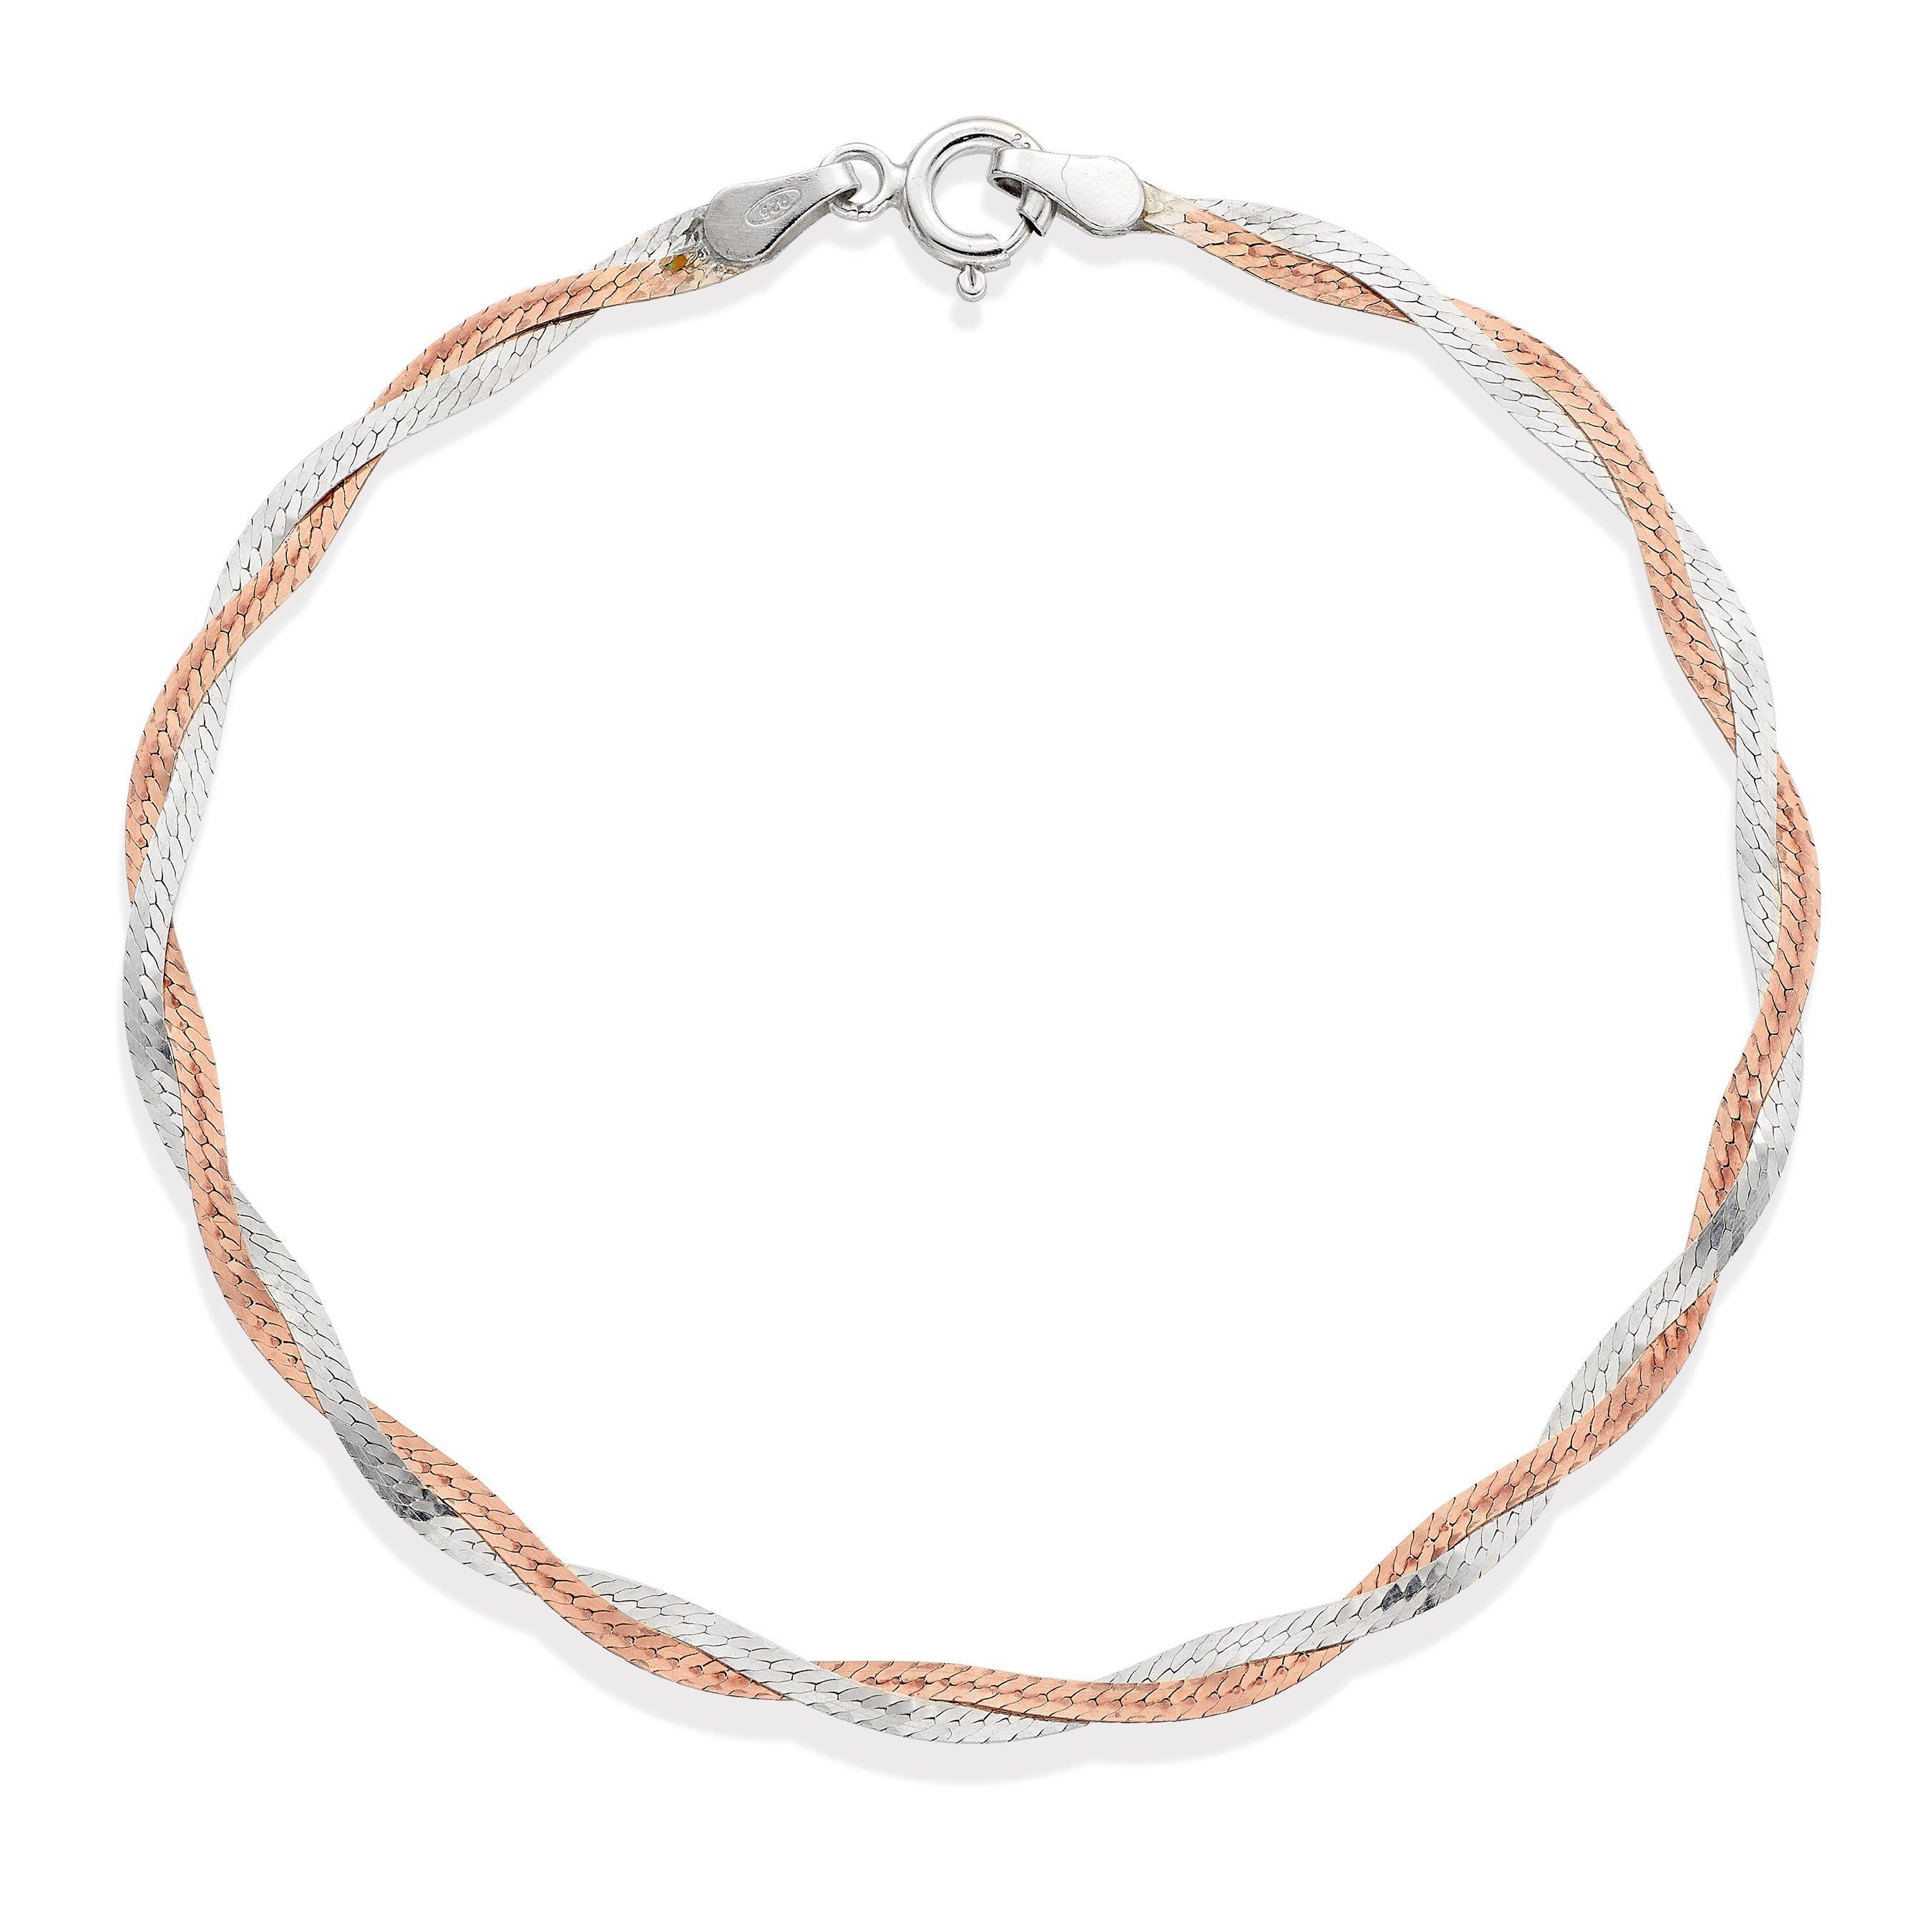 Silver 18ct Rose Gold Plated Plait Bracelet